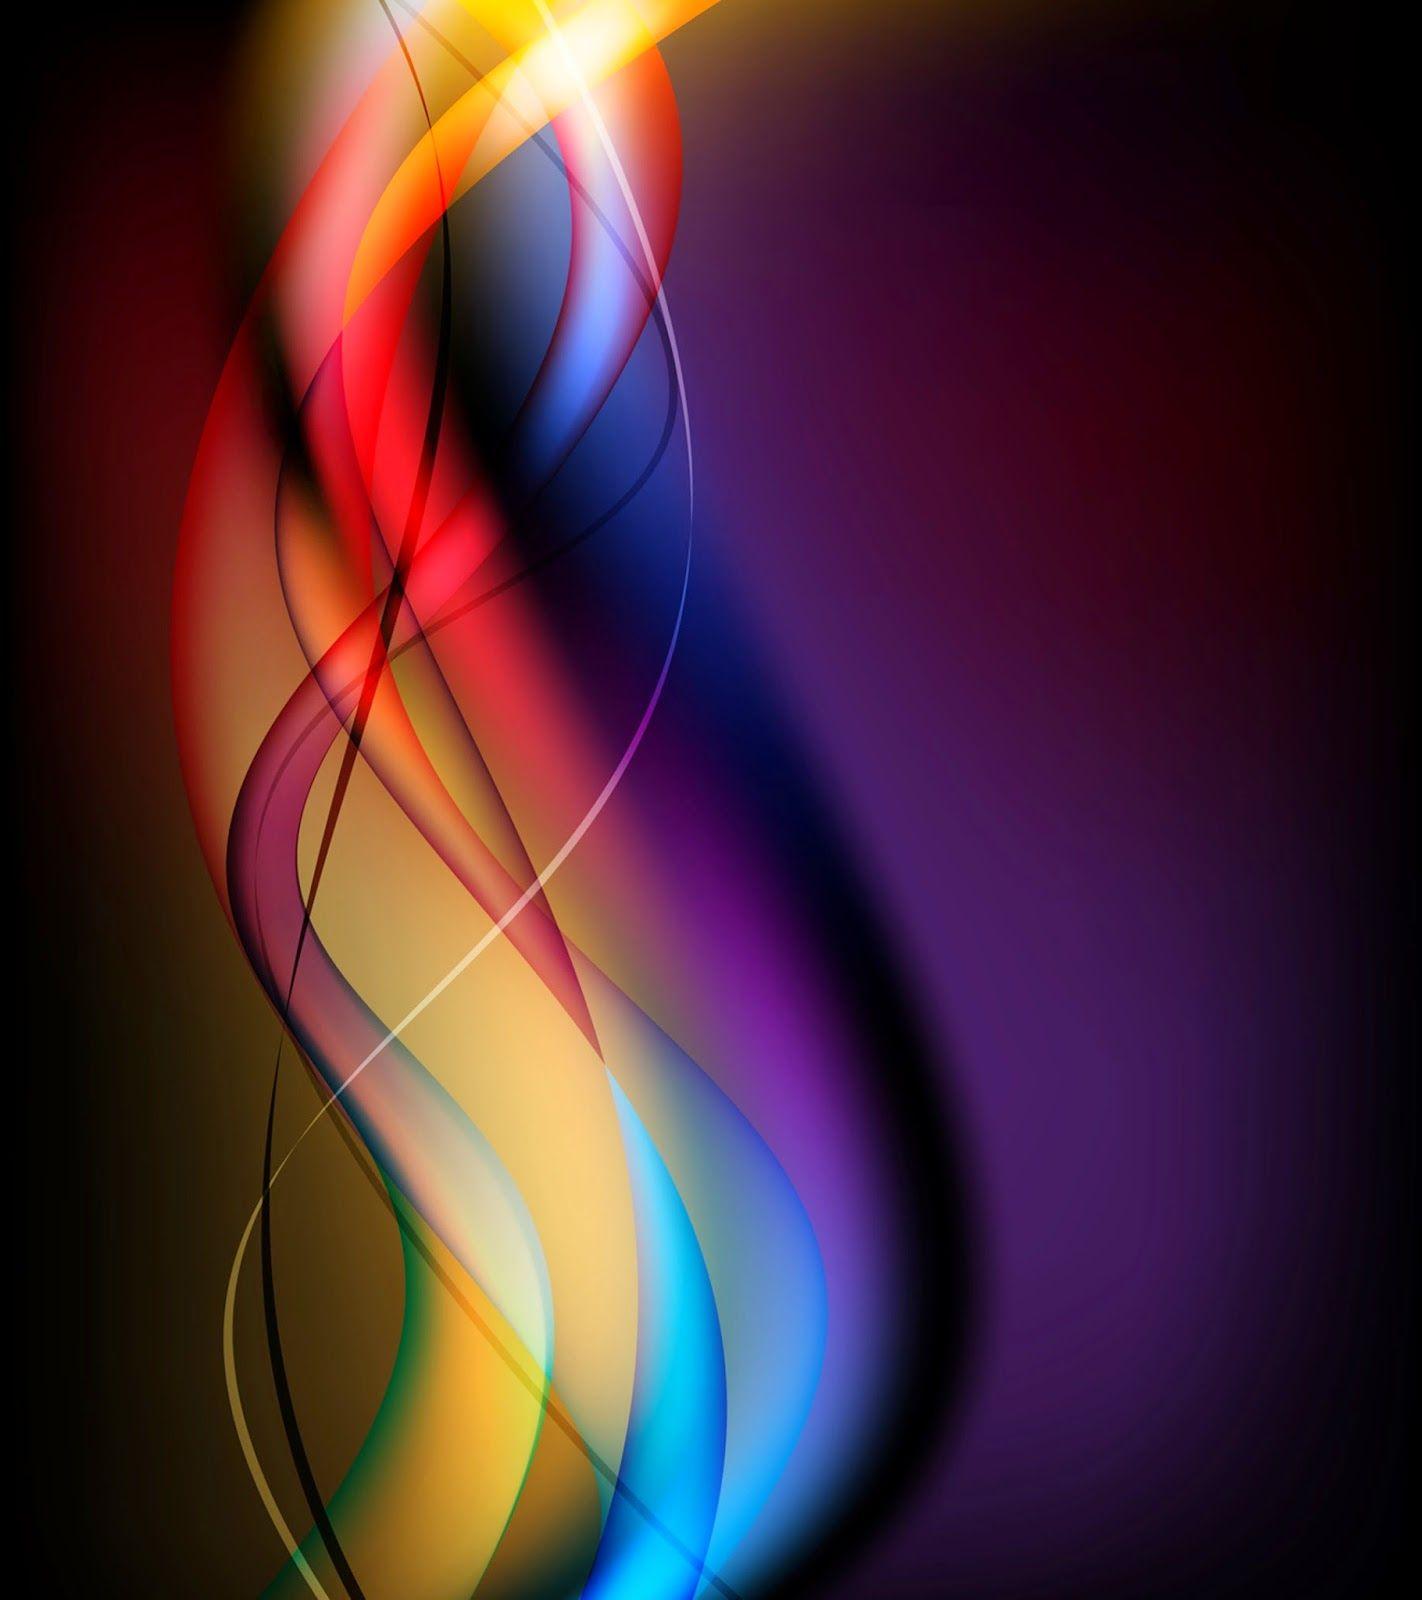 HD Wallpapers: Abstract Wallpaper